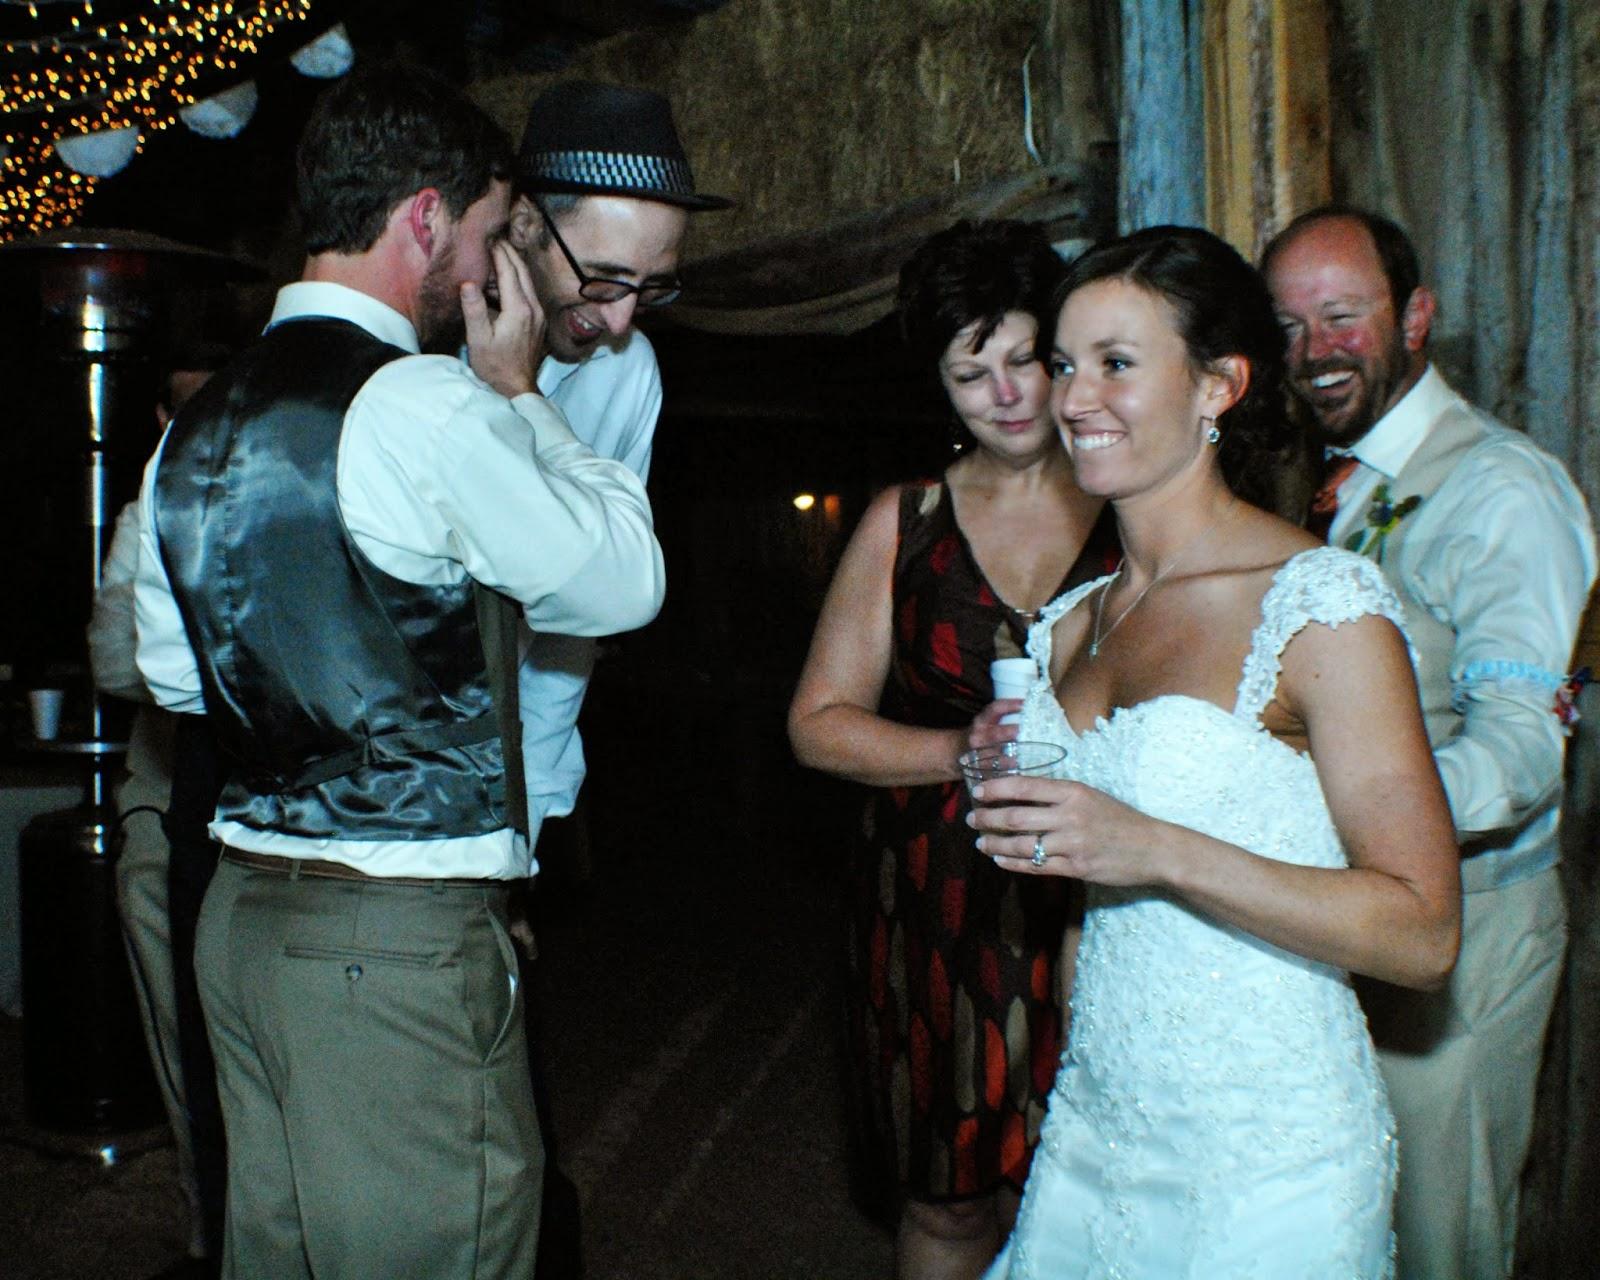 With Class LLC Wedding Coordination Party DJ - The Barn at High Point Farm - Flintstone, GA - DJ Mark